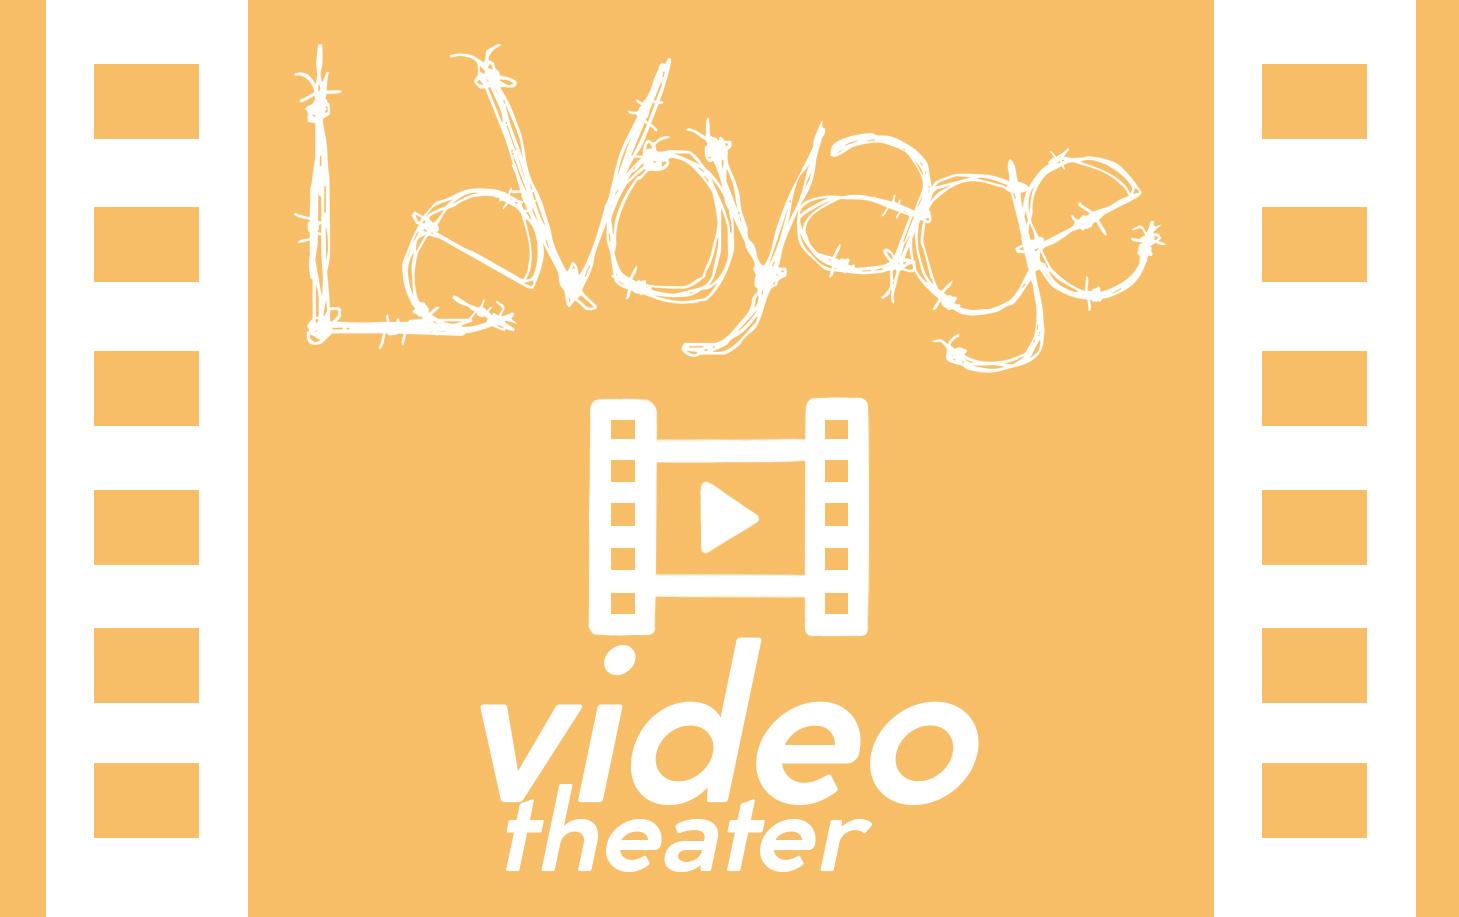 VIDEO LEVOYAGE theater